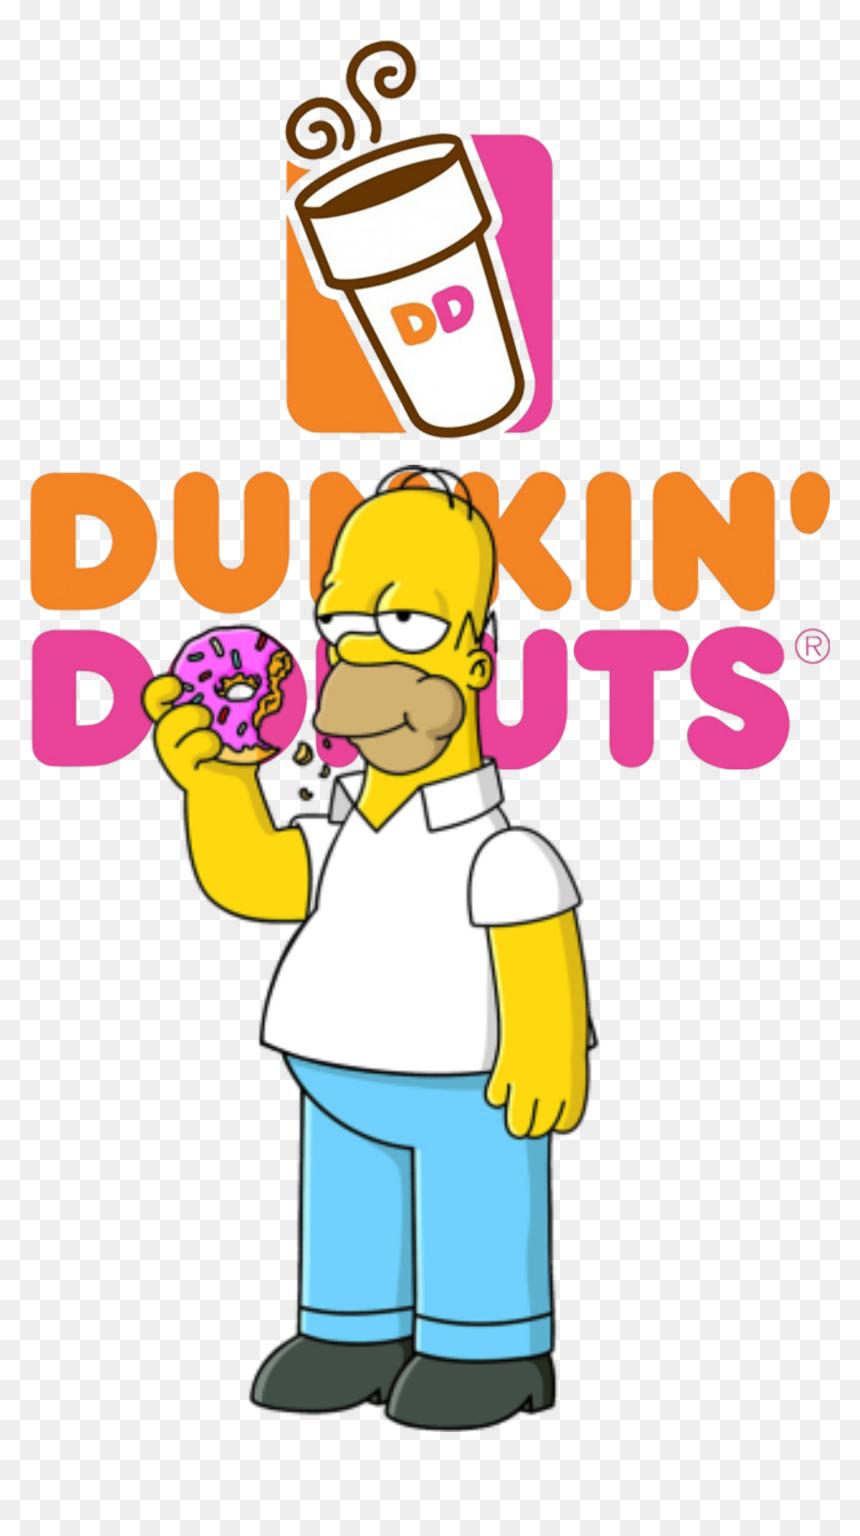 clipartmax donuts dunkin resolution transparent vhv